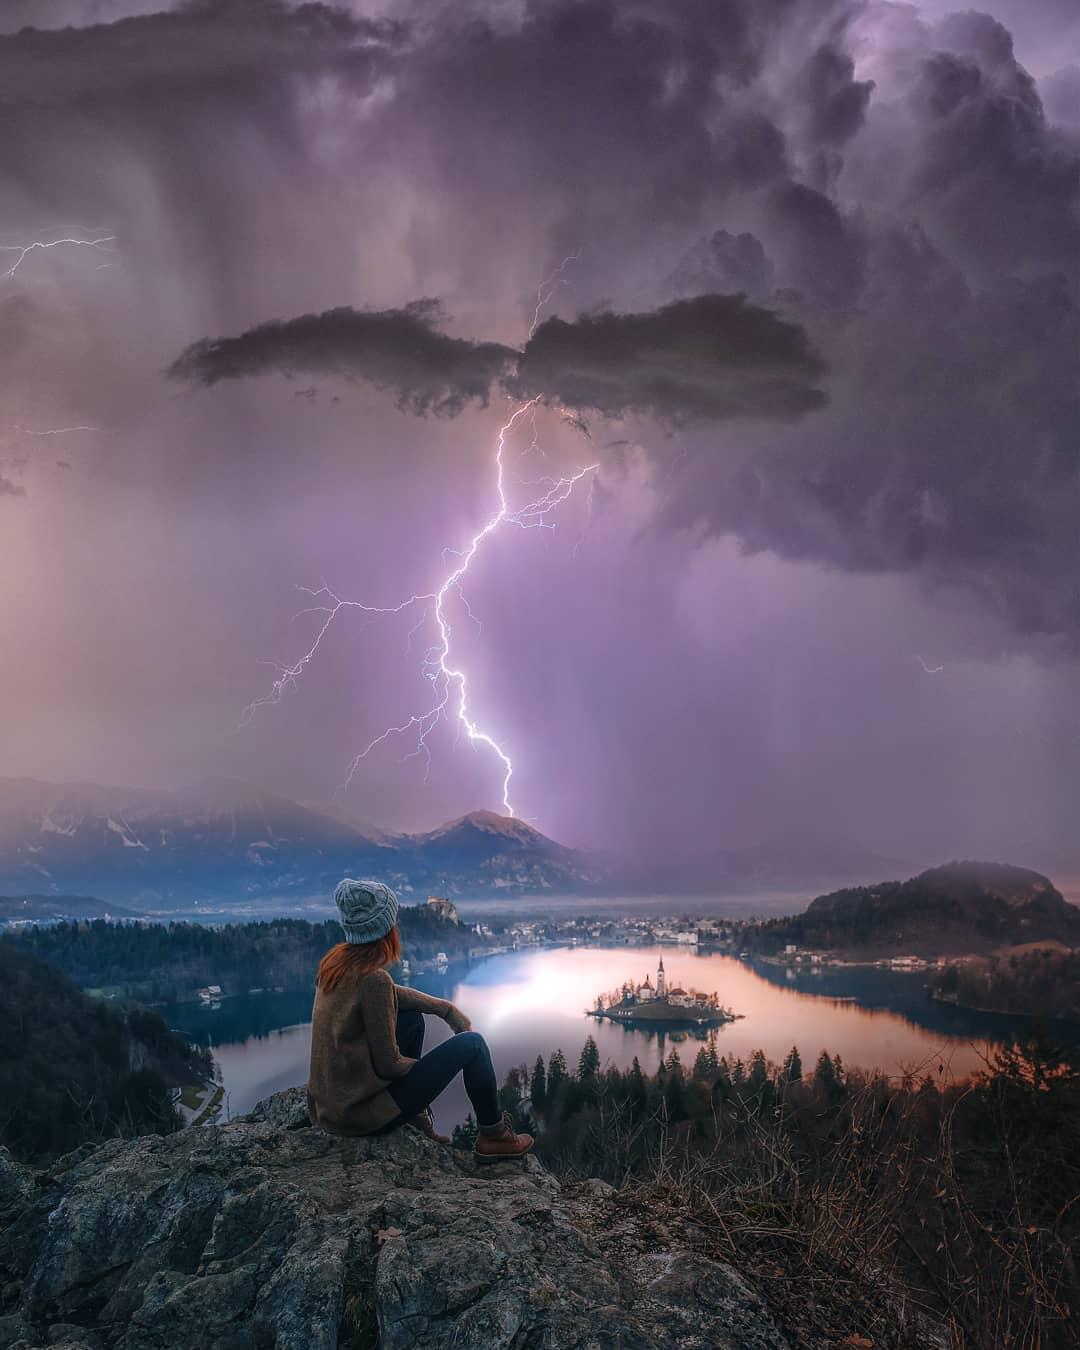 Штормы, молнии и звезды на снимках Брента Шавнора (25 фото)